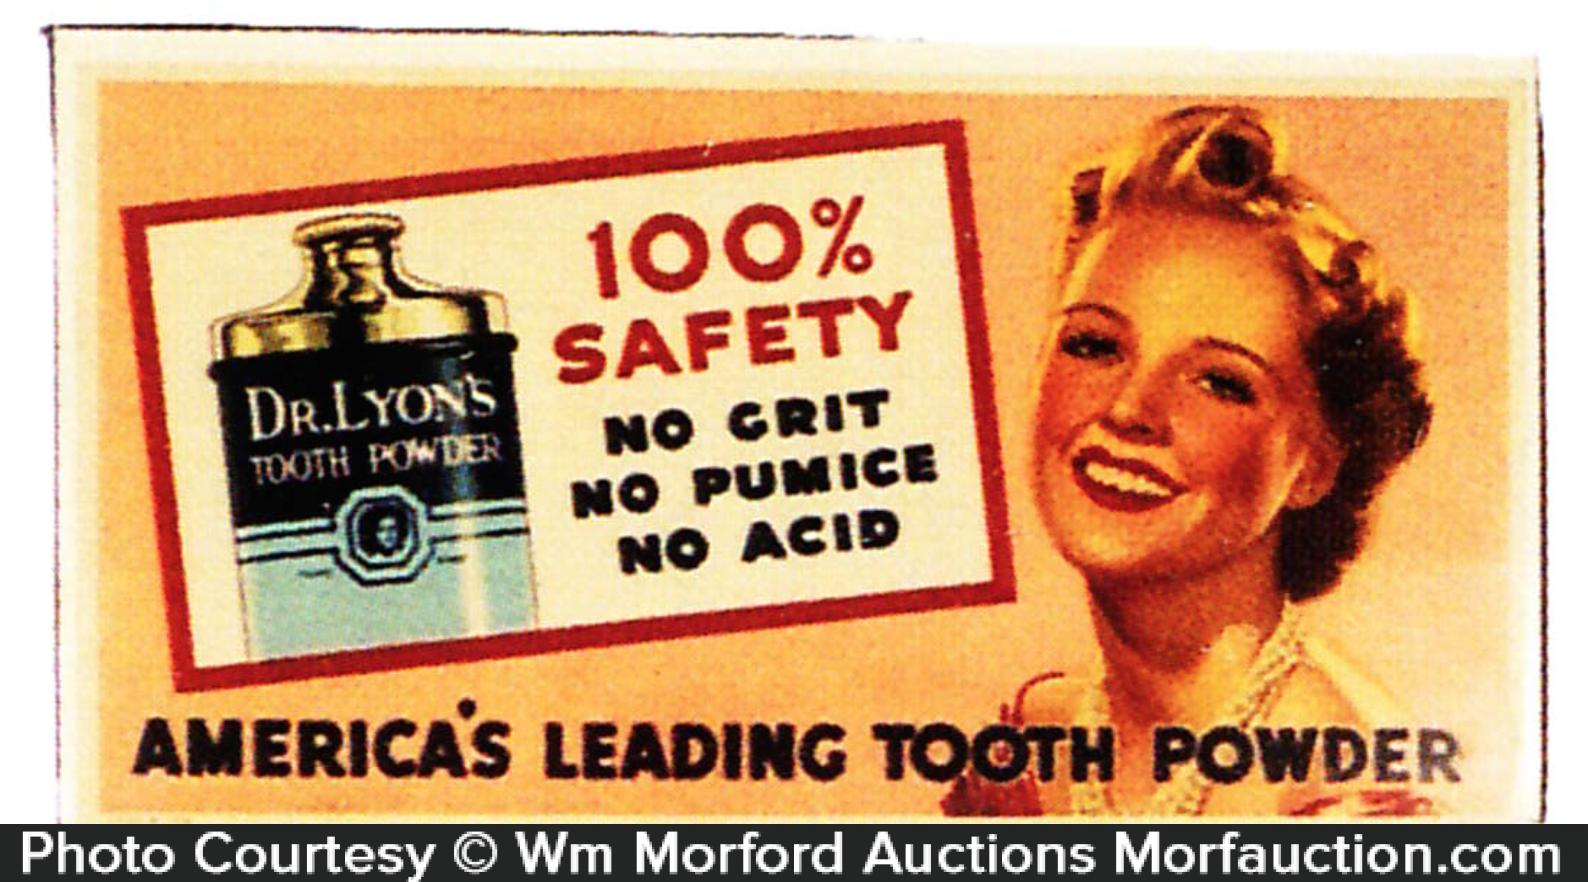 Dr. Lyon's Tooth Powder Tin